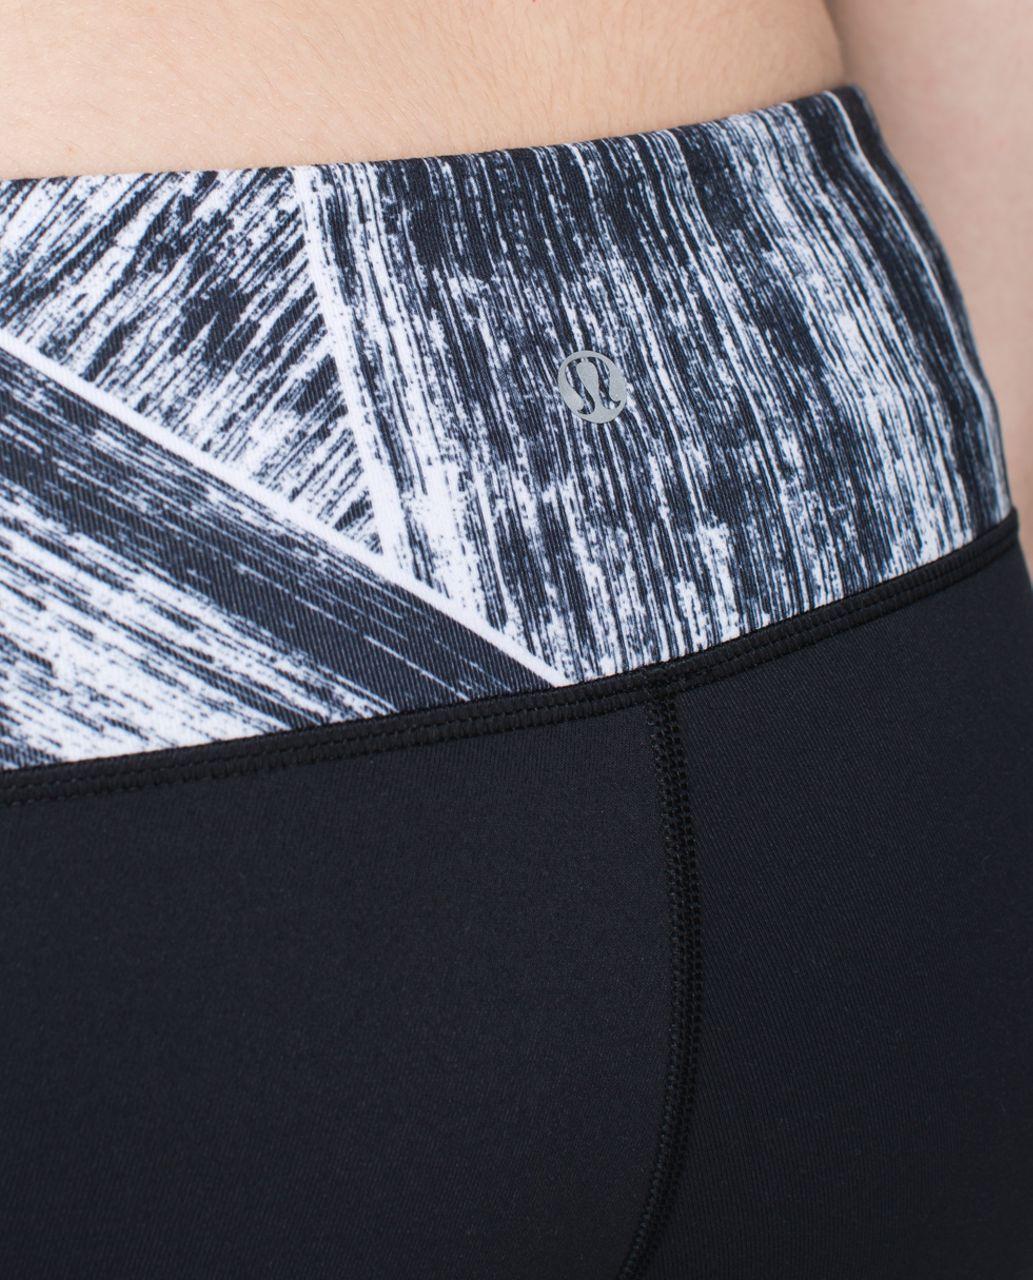 Lululemon Wunder Under Pant *Full-On Luon - Black / Heat Wave White Black